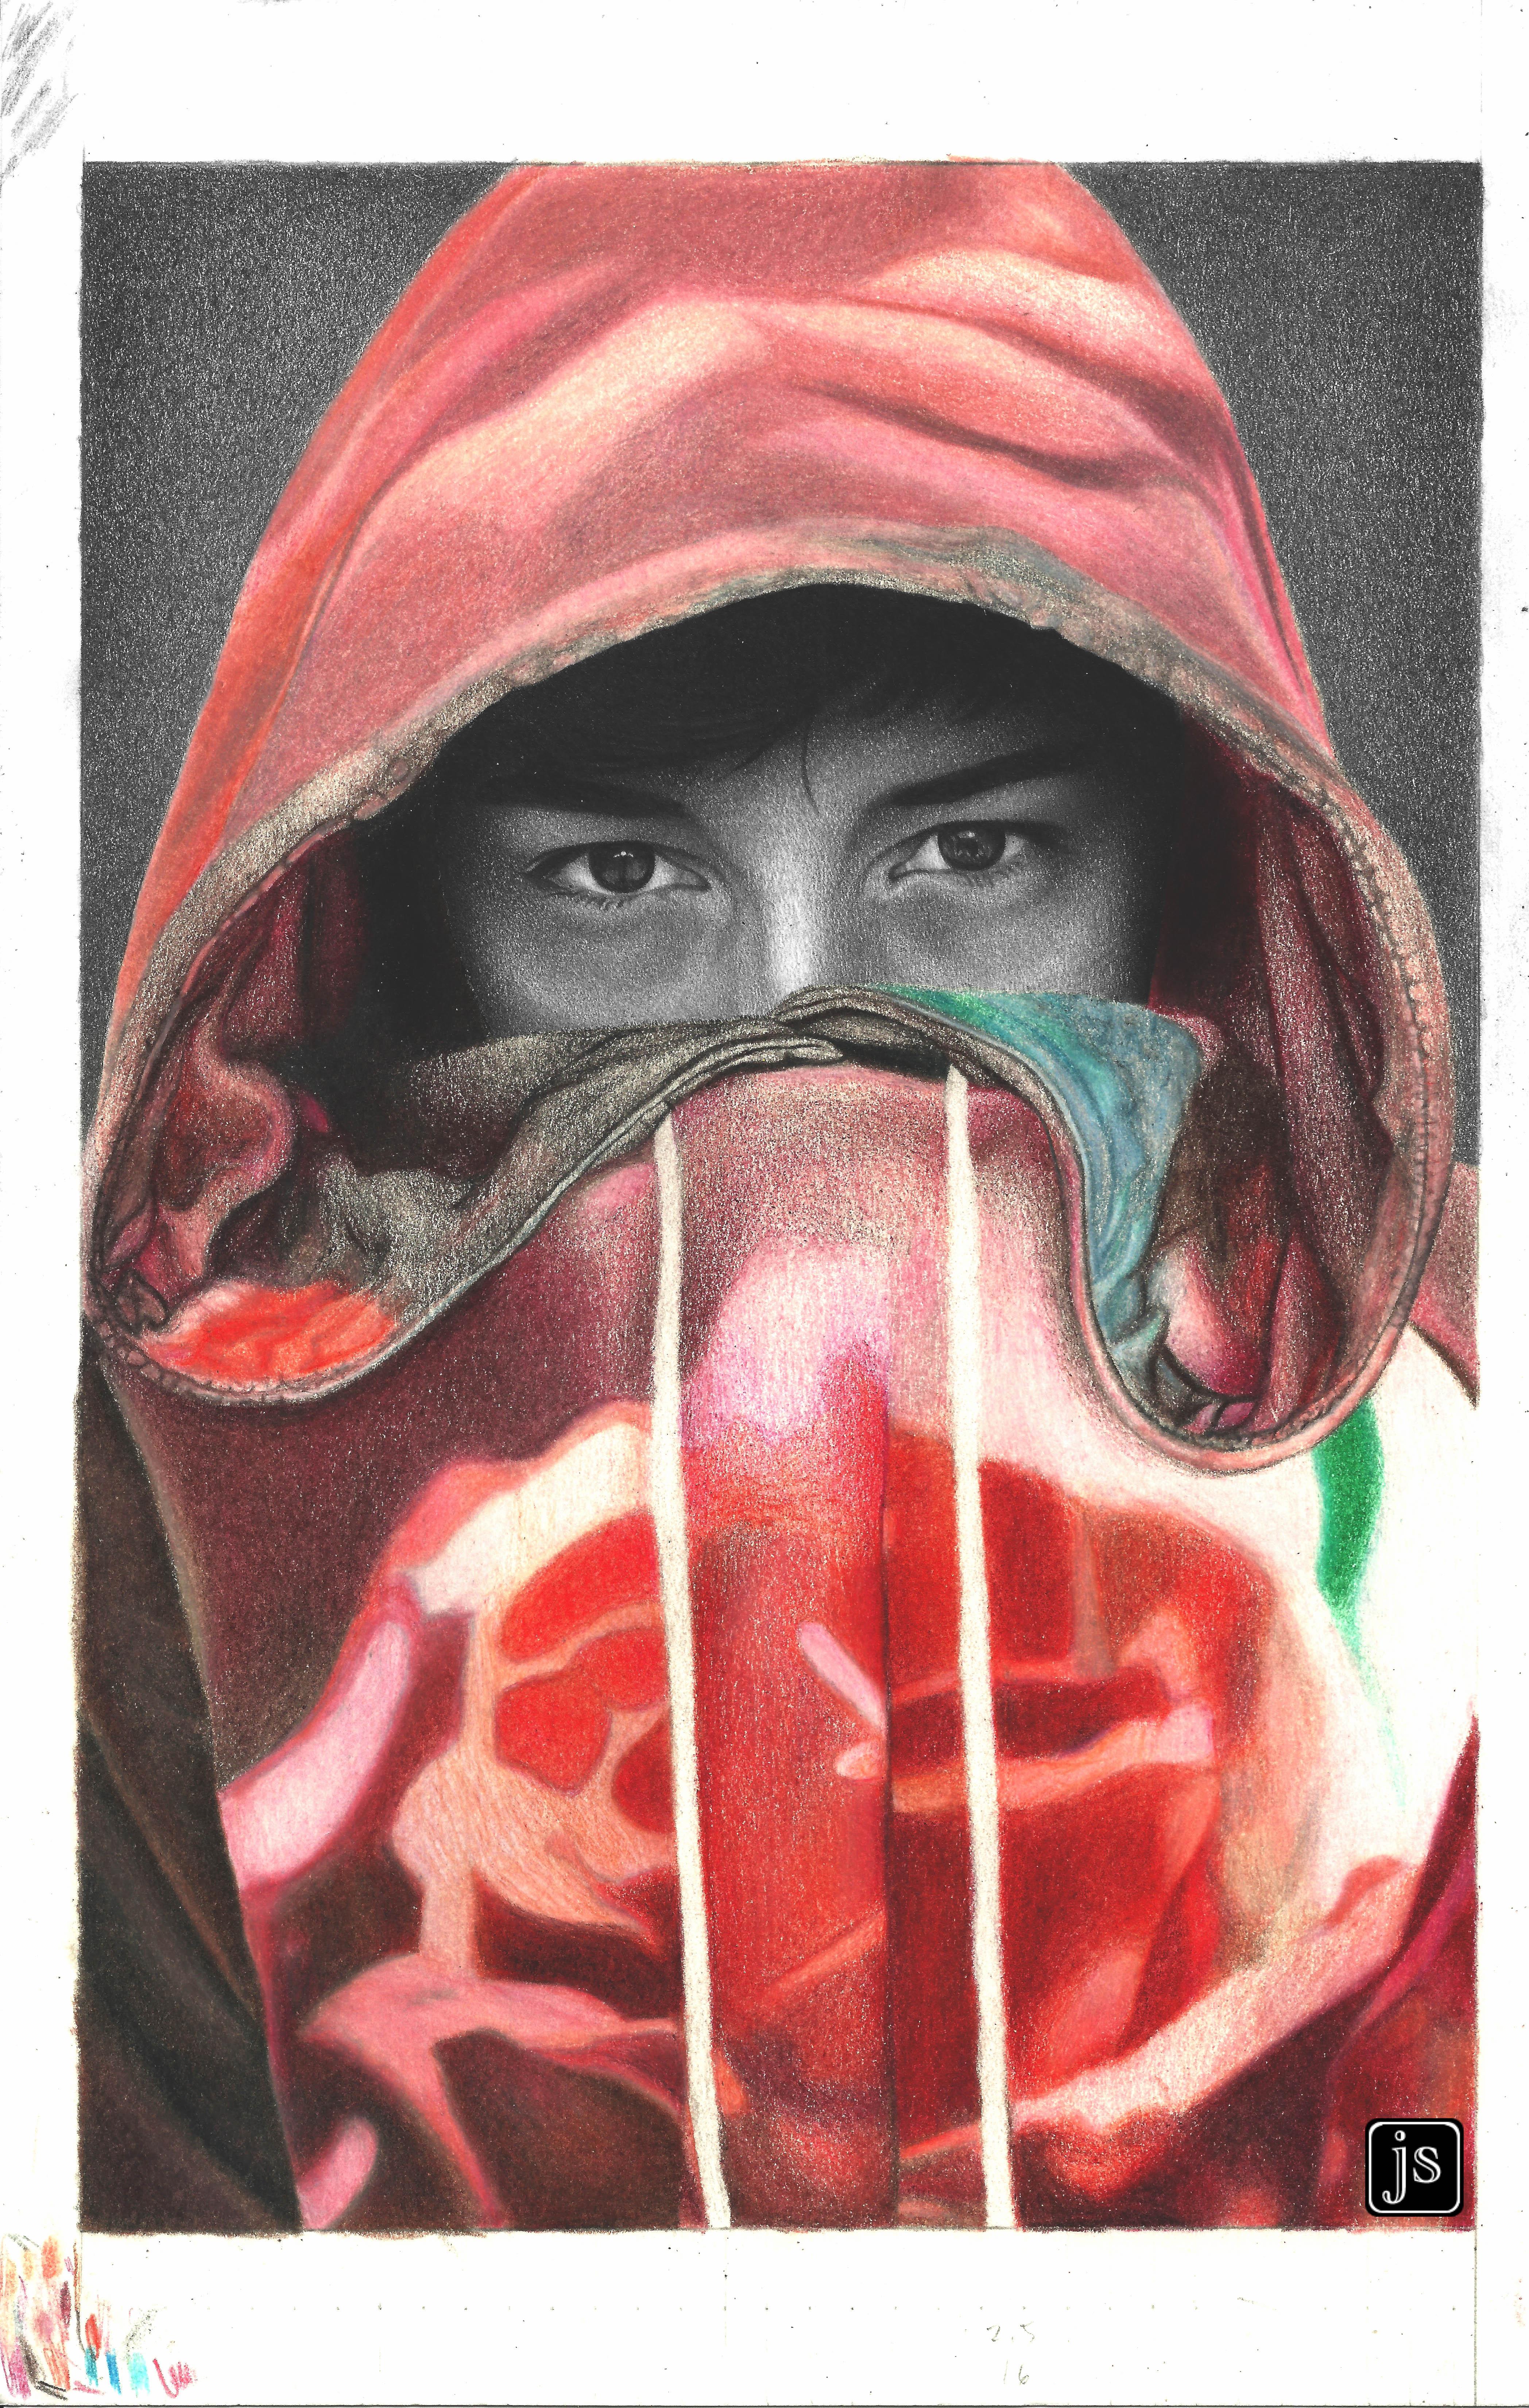 Francisco Lachowski Pencil and Color – jsanmateoart